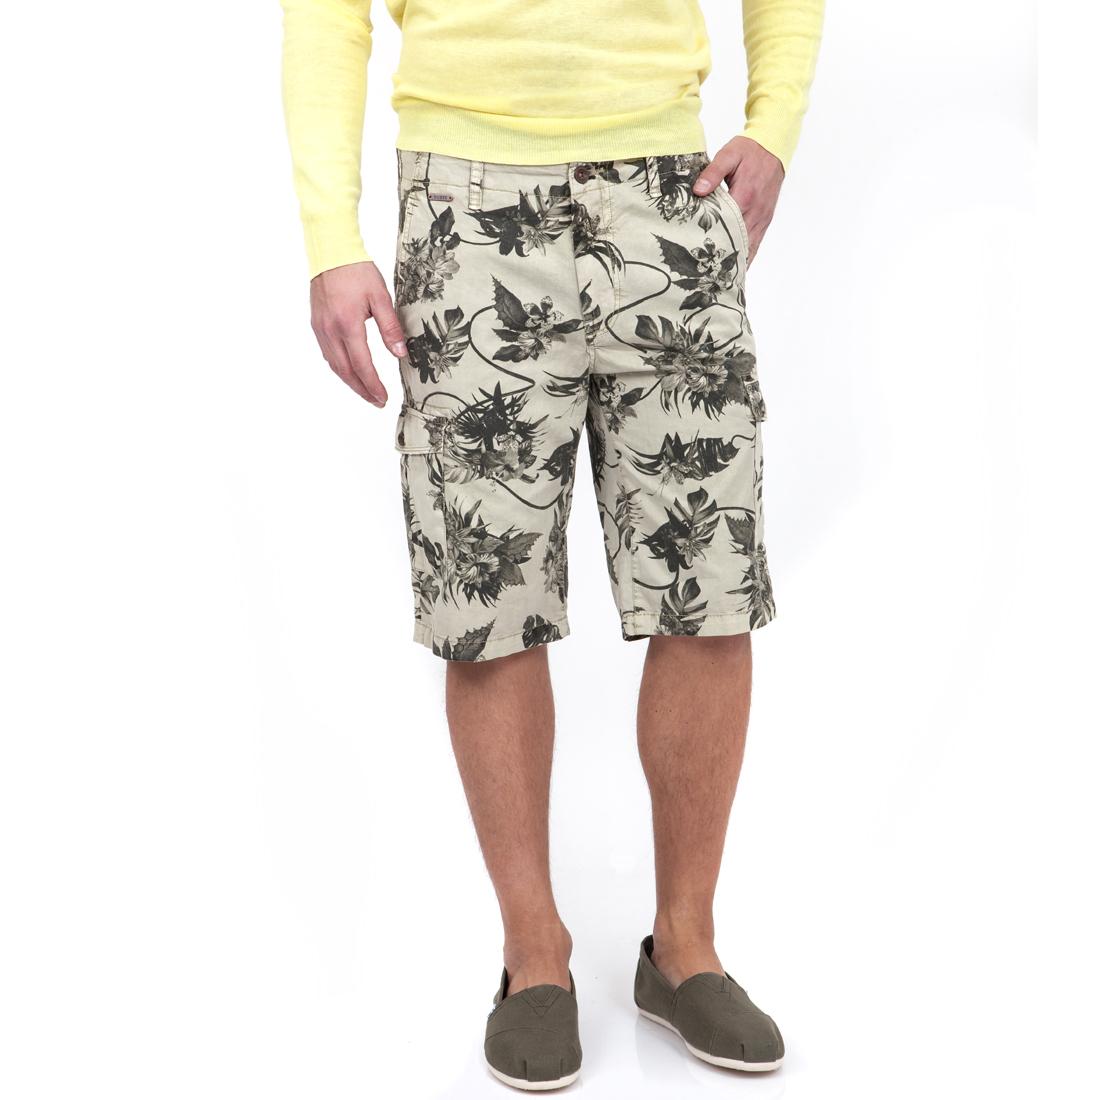 GUESS - Ανδρική βερμούδα GUESS μπεζ ανδρικά ρούχα σορτς βερμούδες casual jean